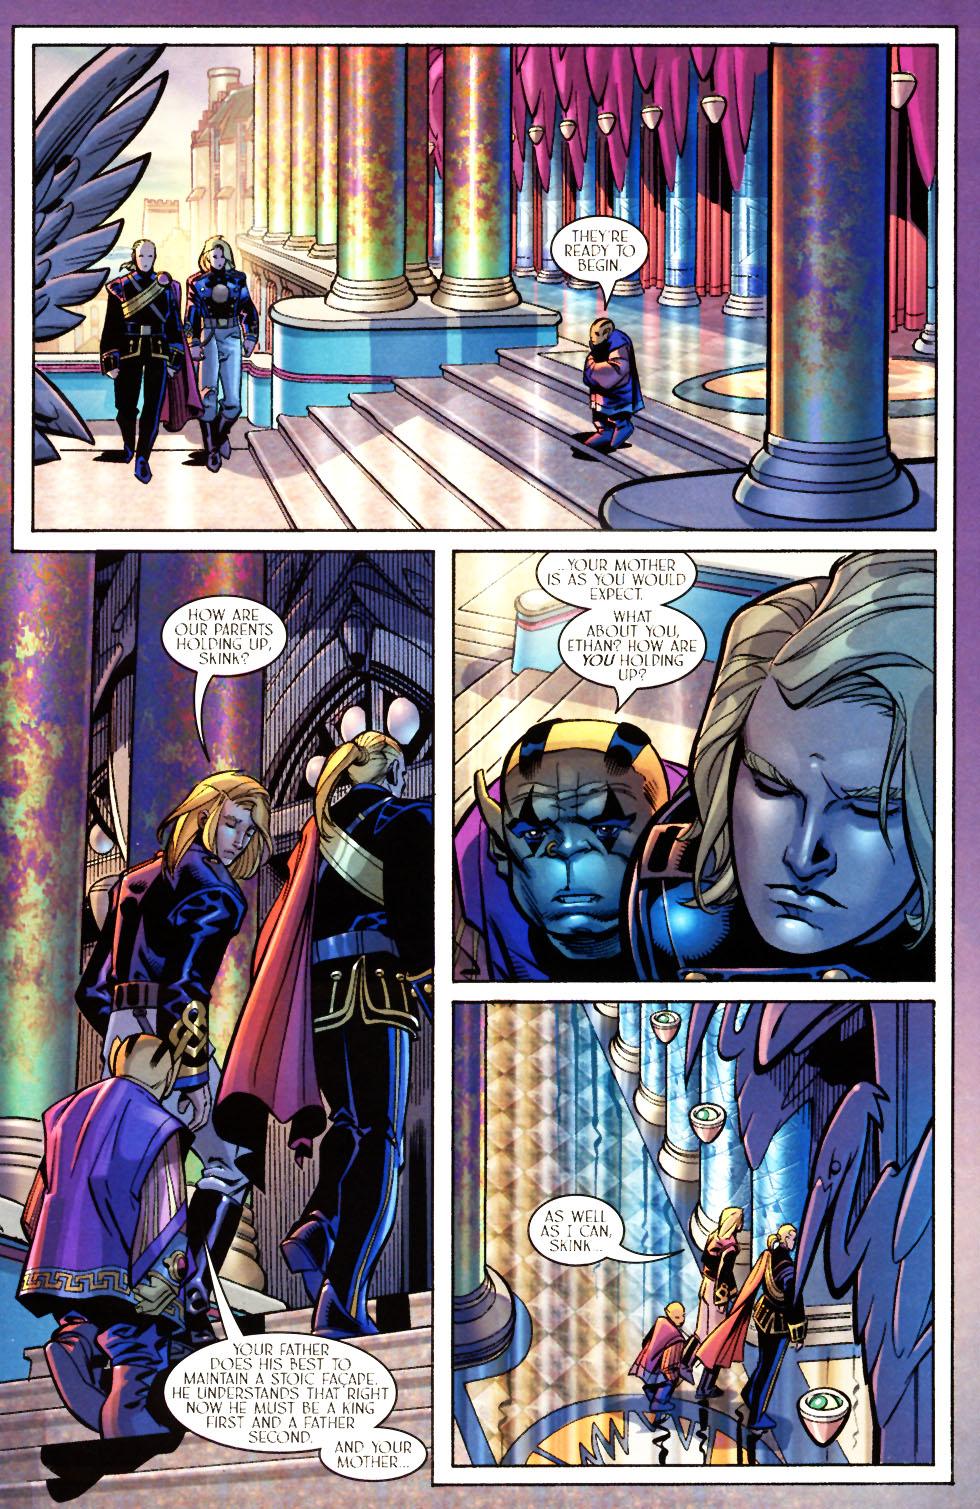 Read online Scion comic -  Issue #7 - 7